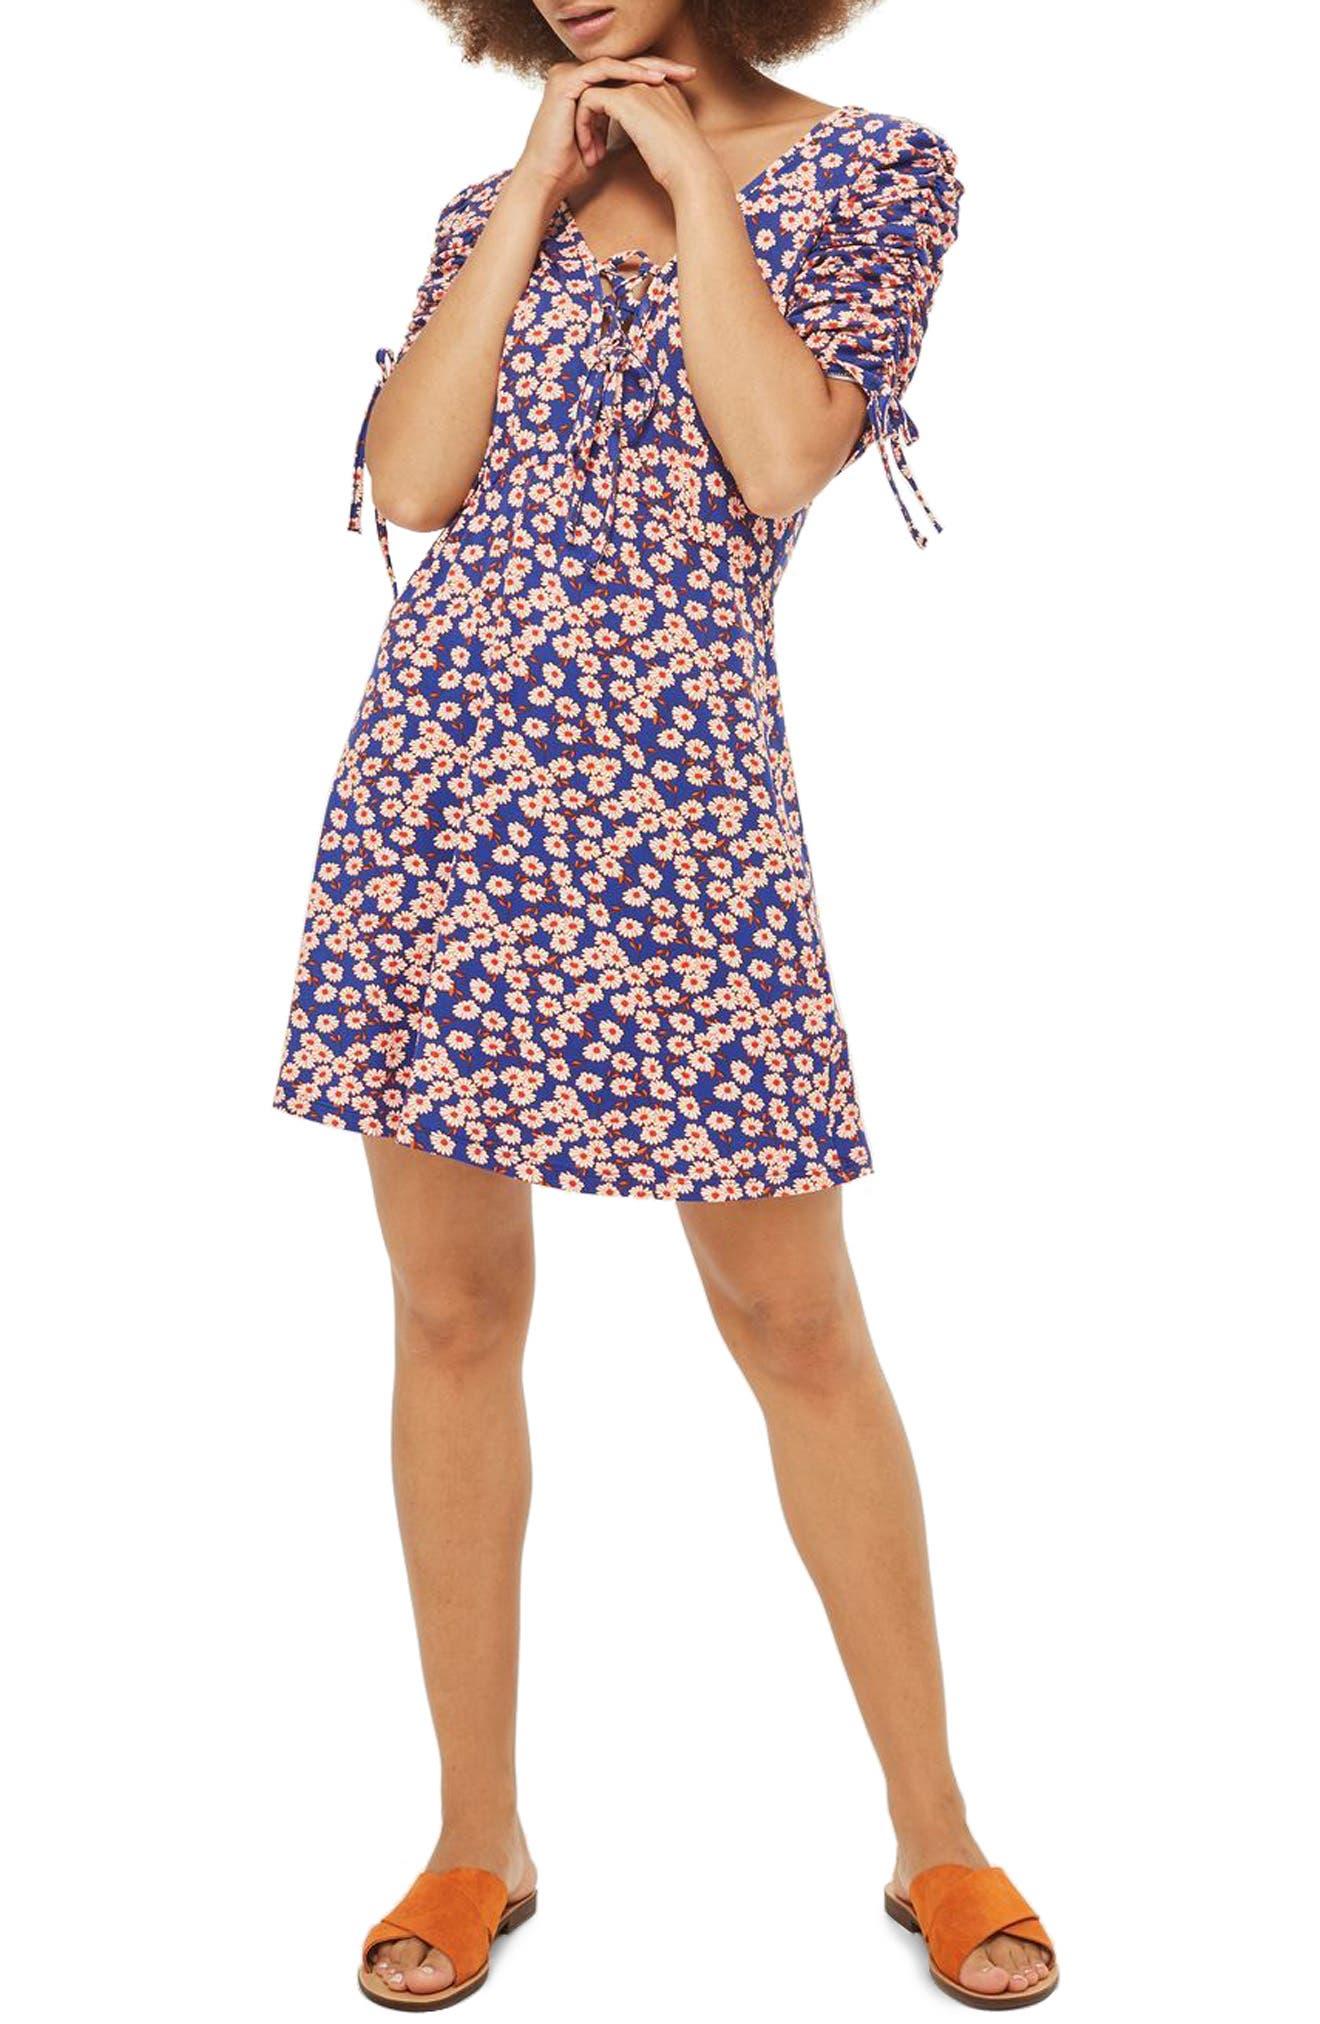 Topshop Daisy Frill Tea Dress (Petite)